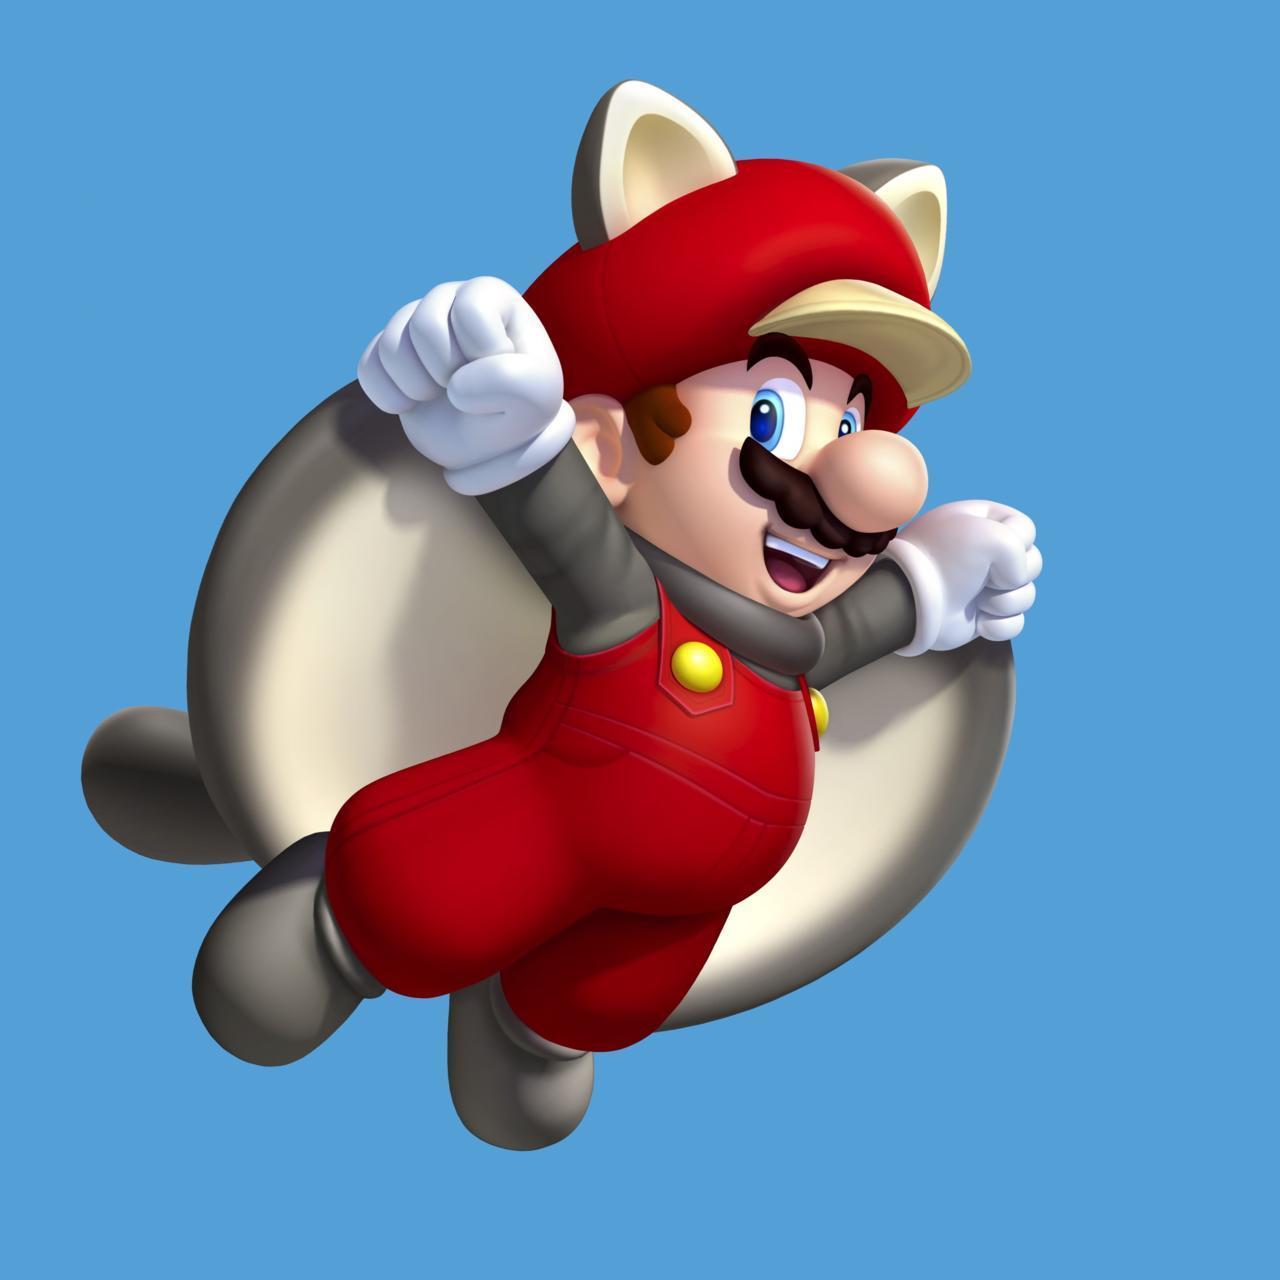 12. Super Mario Brothers